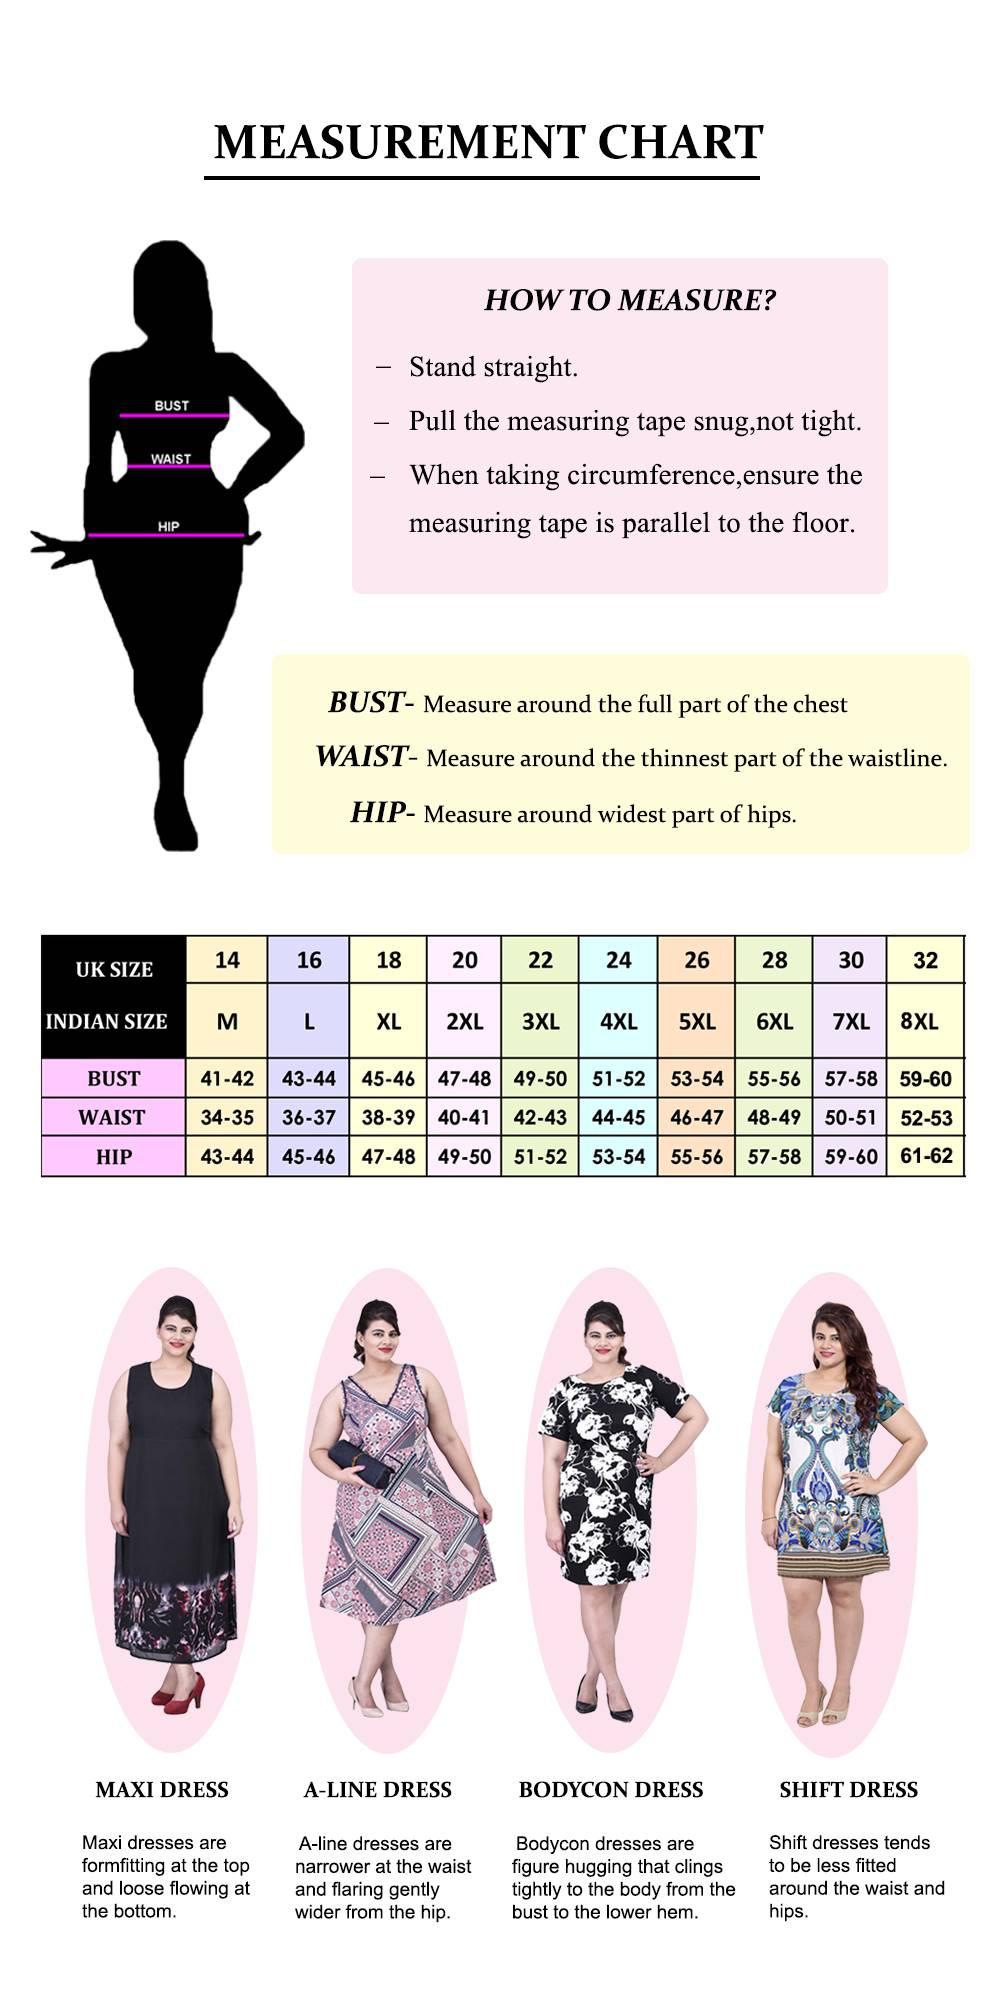 LASTINCH size chart